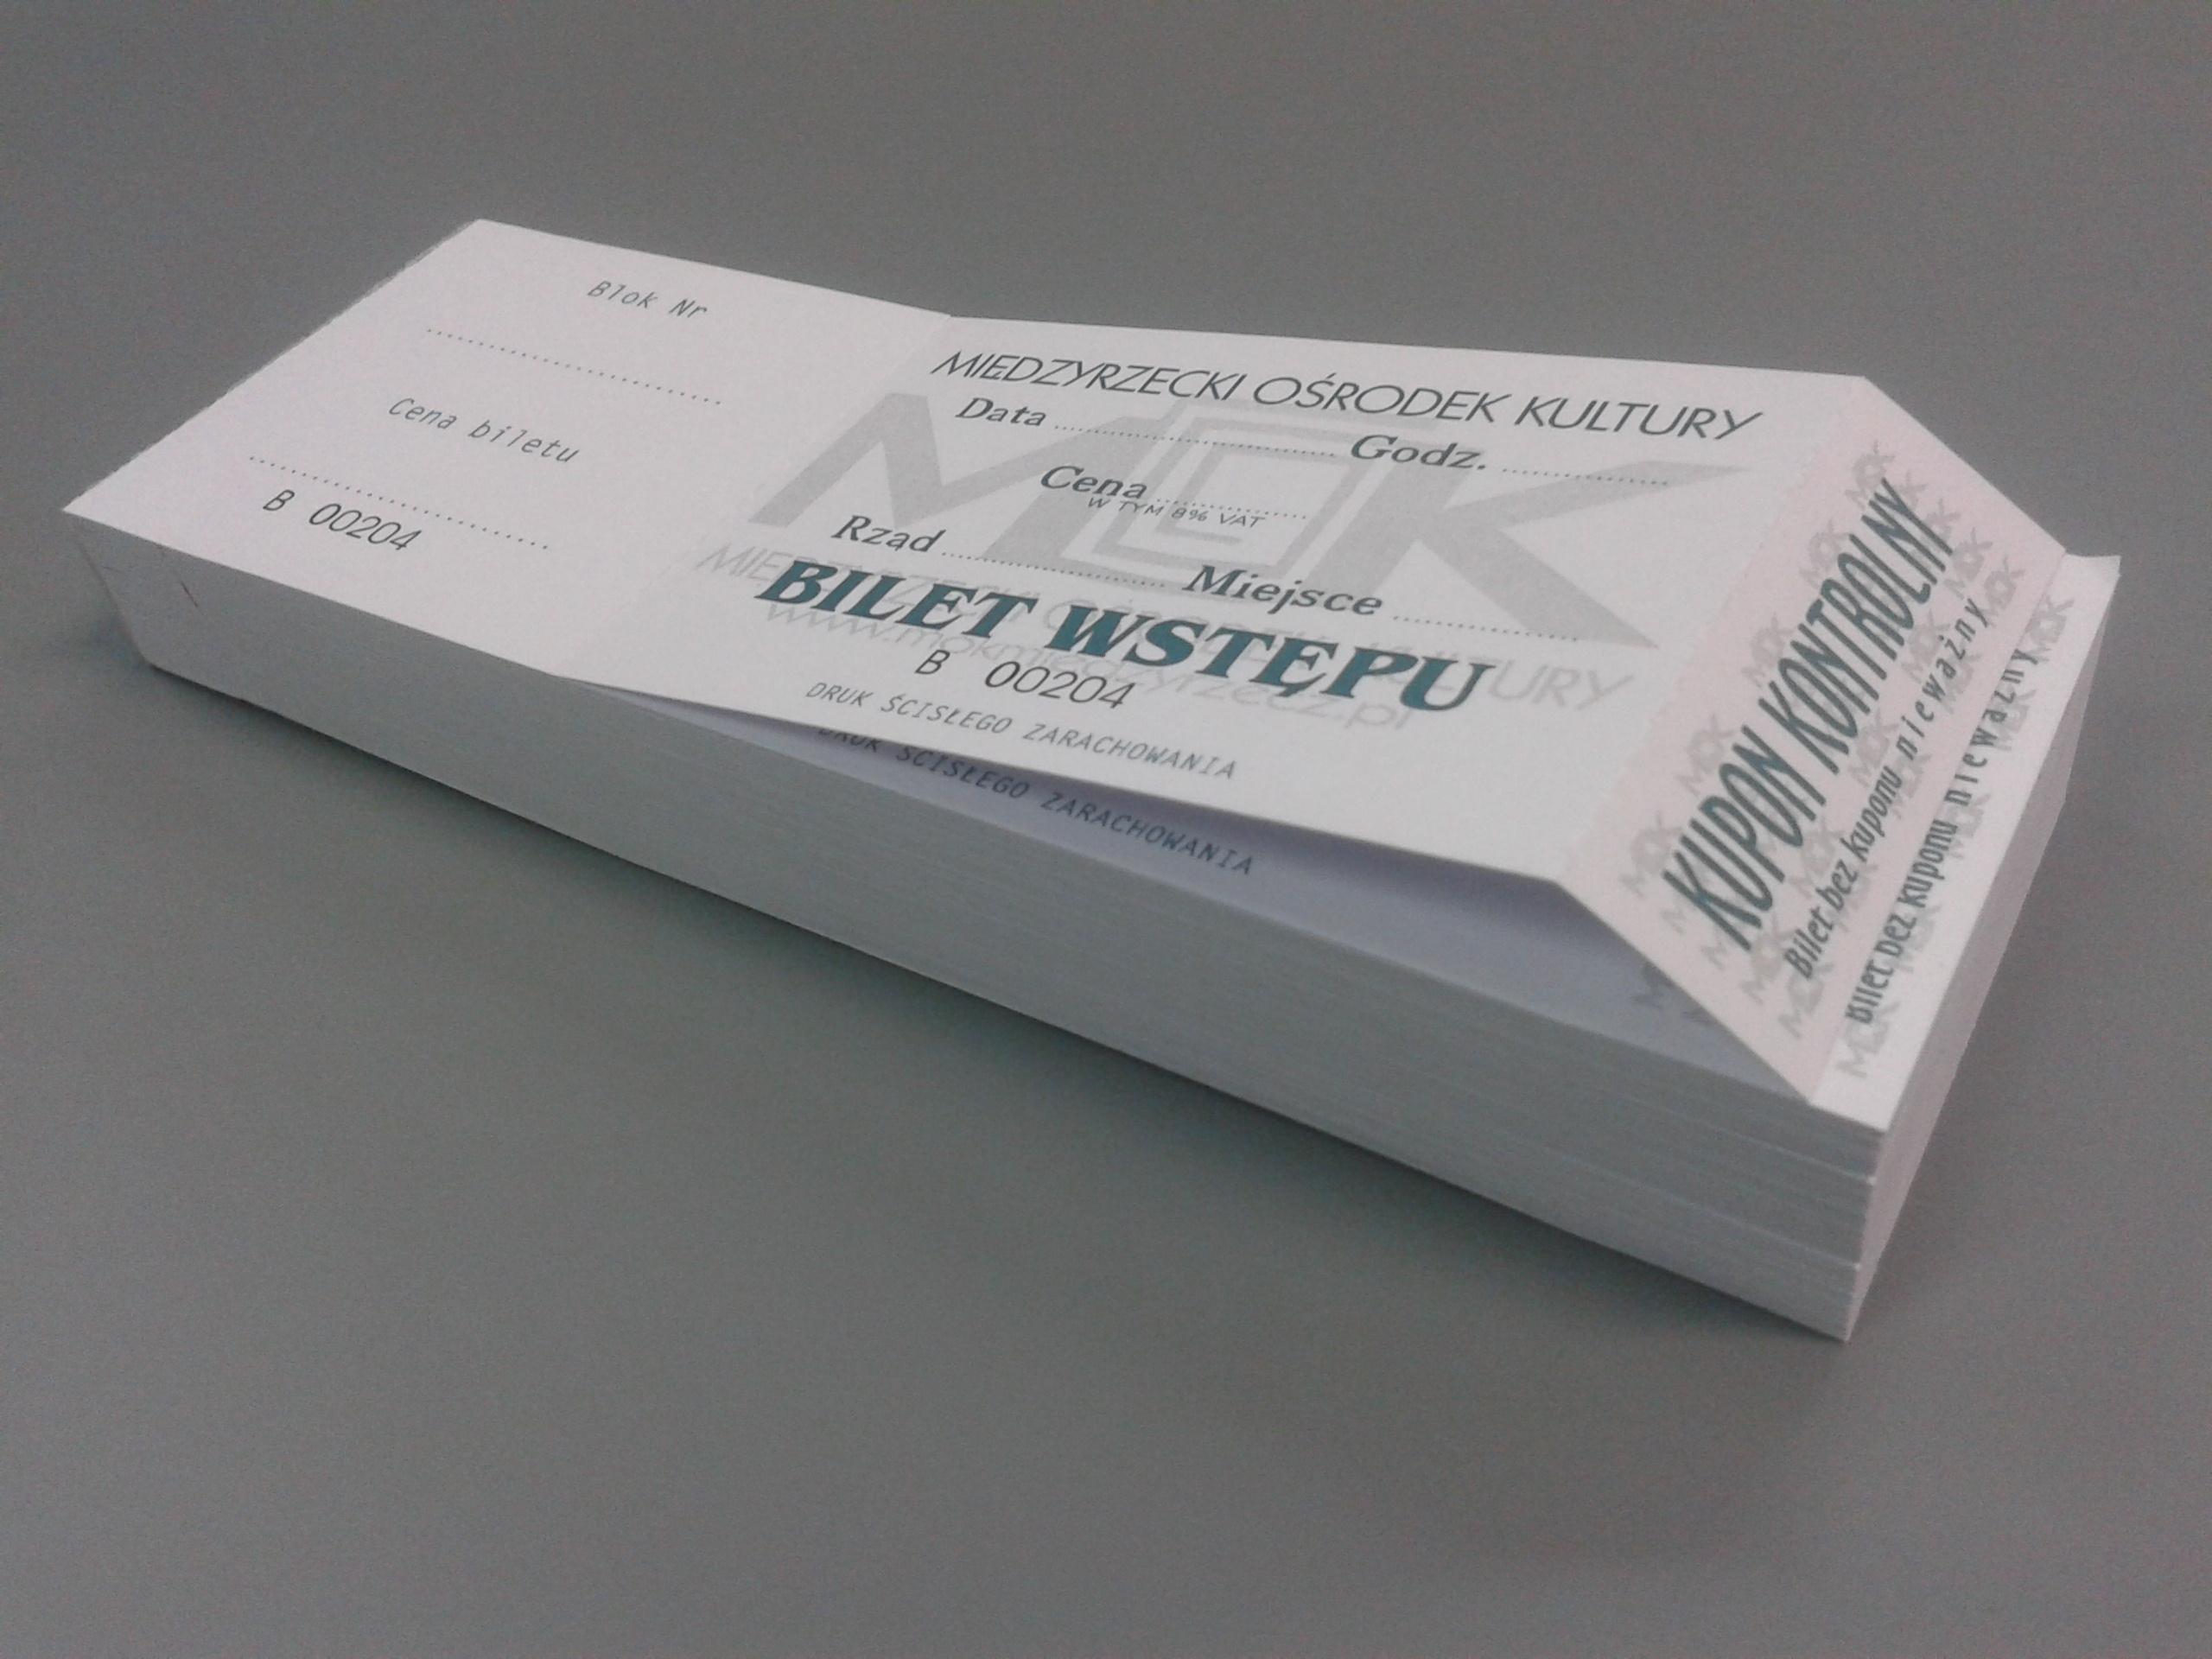 Bilety perforowane